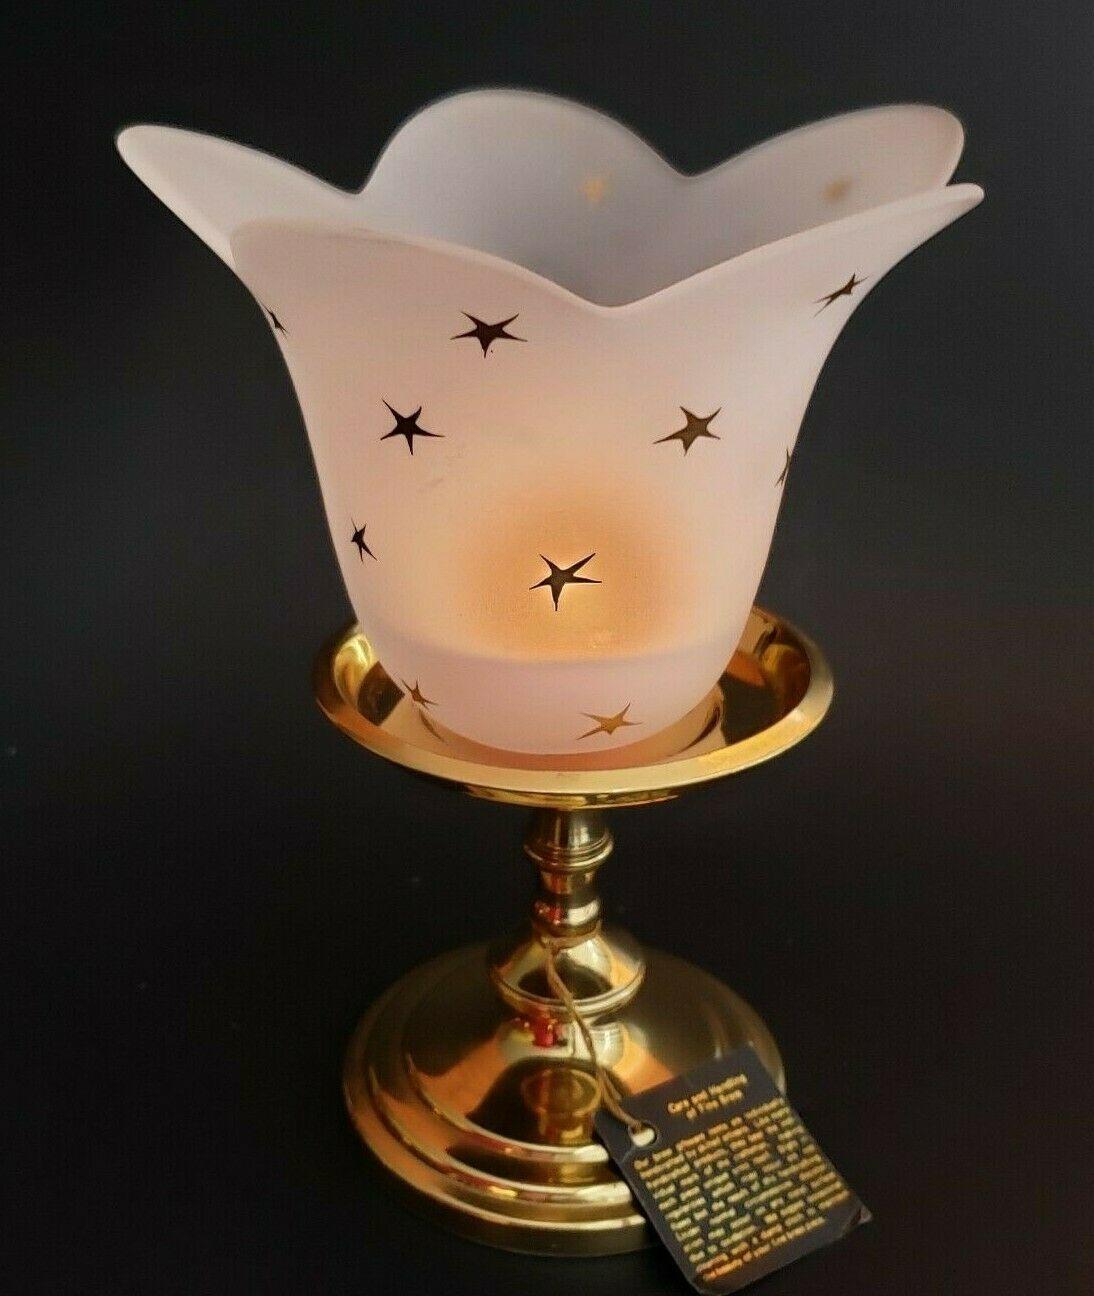 Stellar Blossom Candle Holder White Handblown Glass Gold Stars Partylite P0452